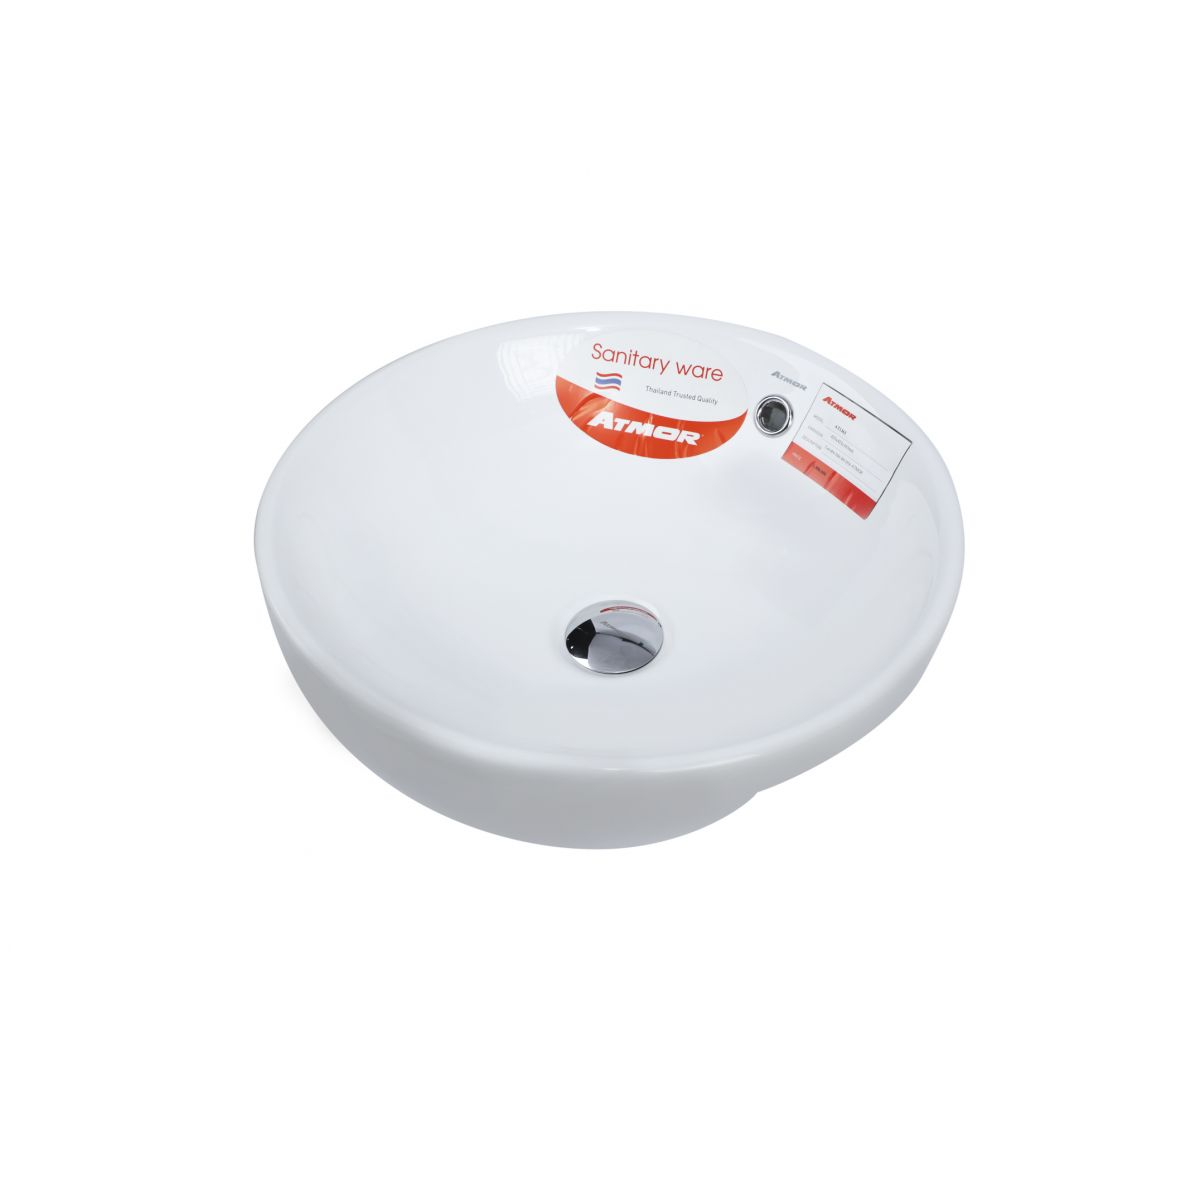 Lavabo bán âm tròn ATMOR AT1363